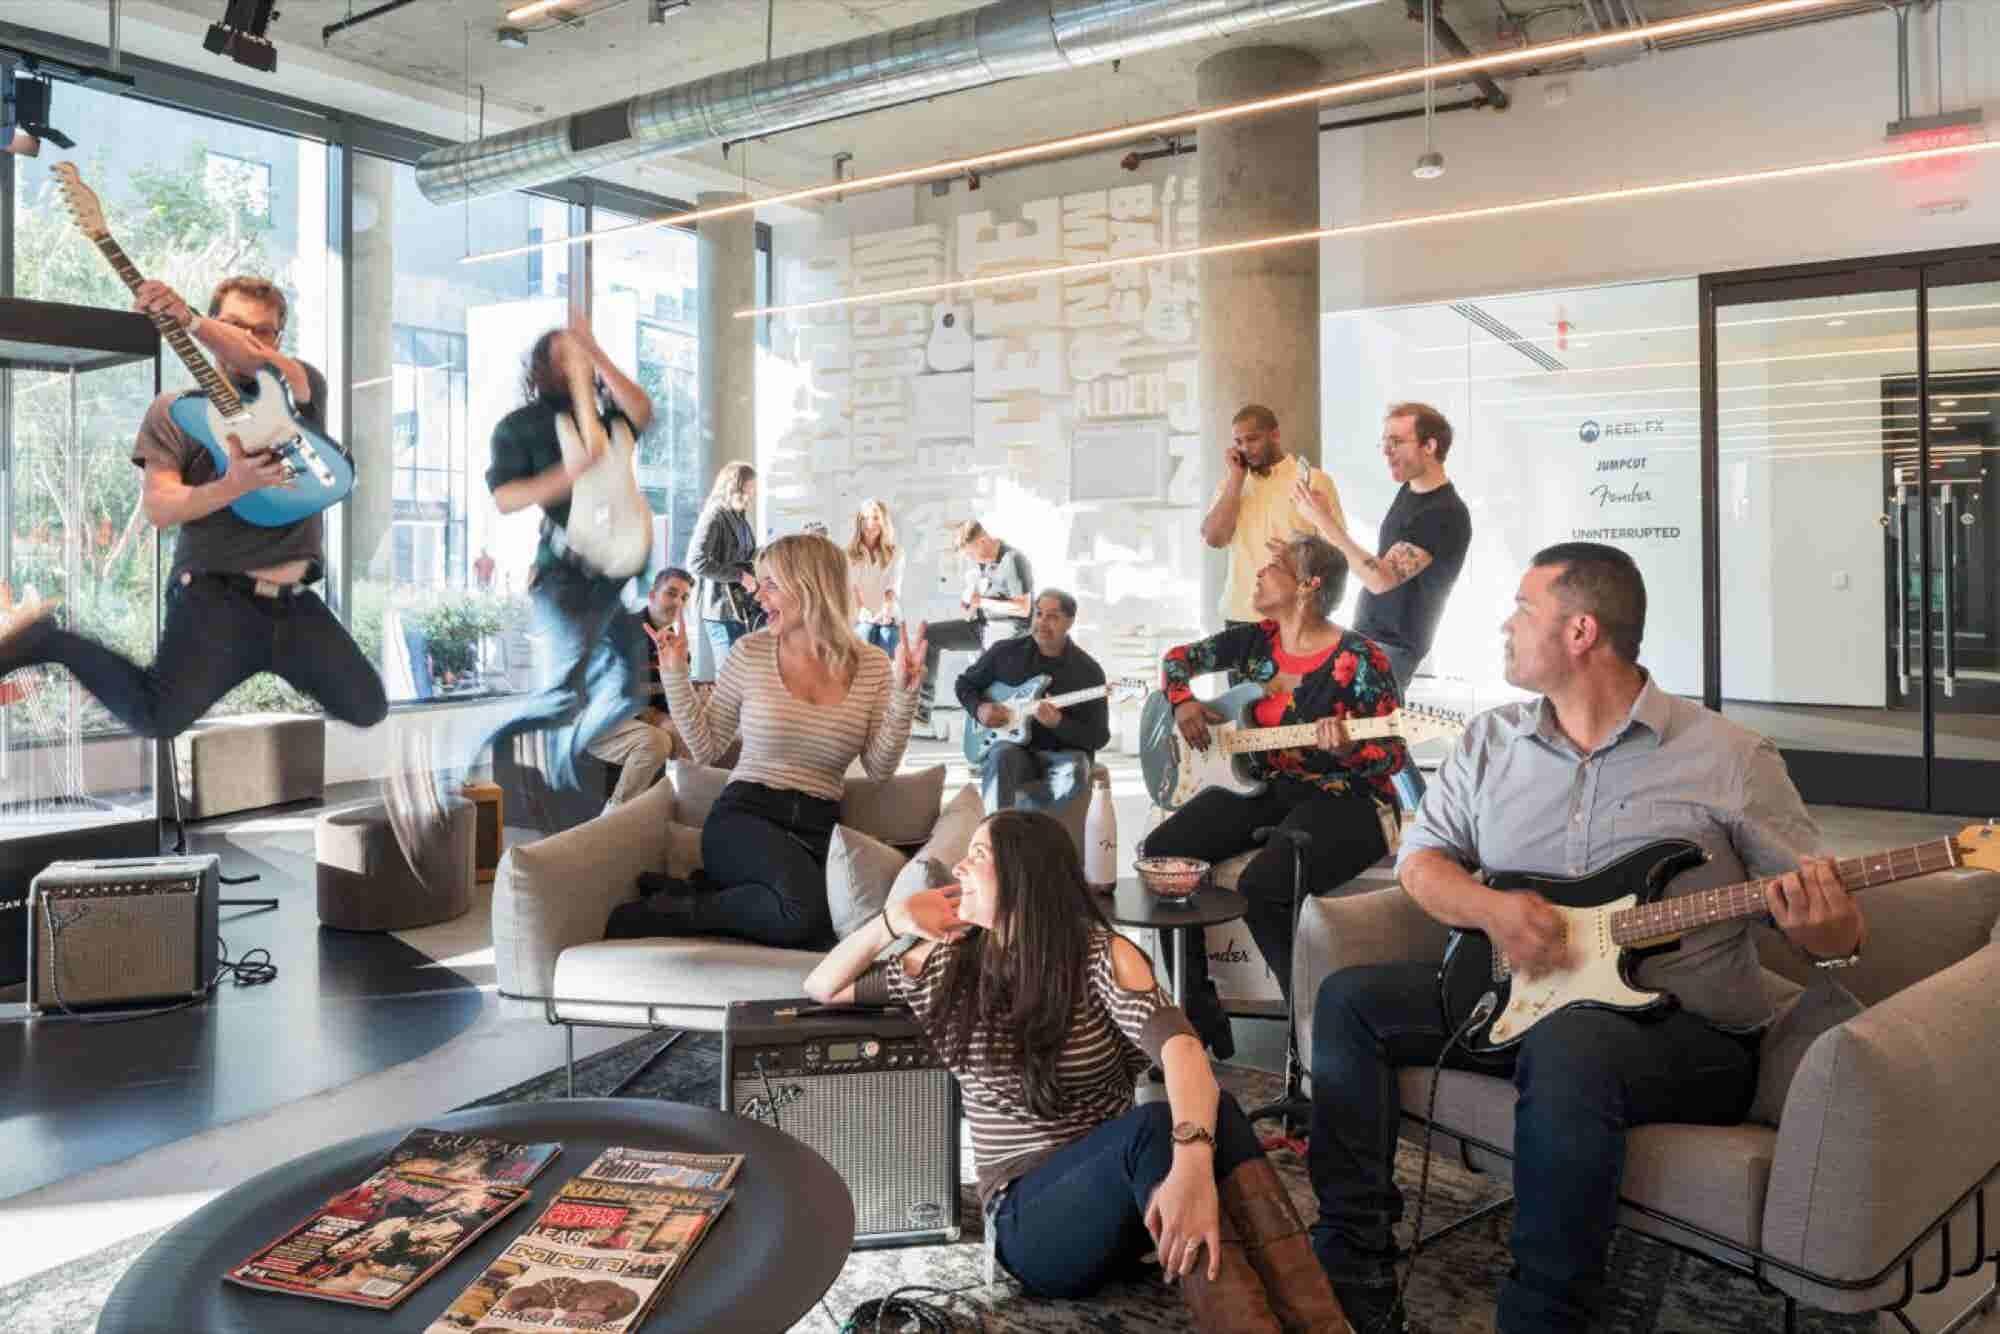 Rocking Out Inside Fender's Office